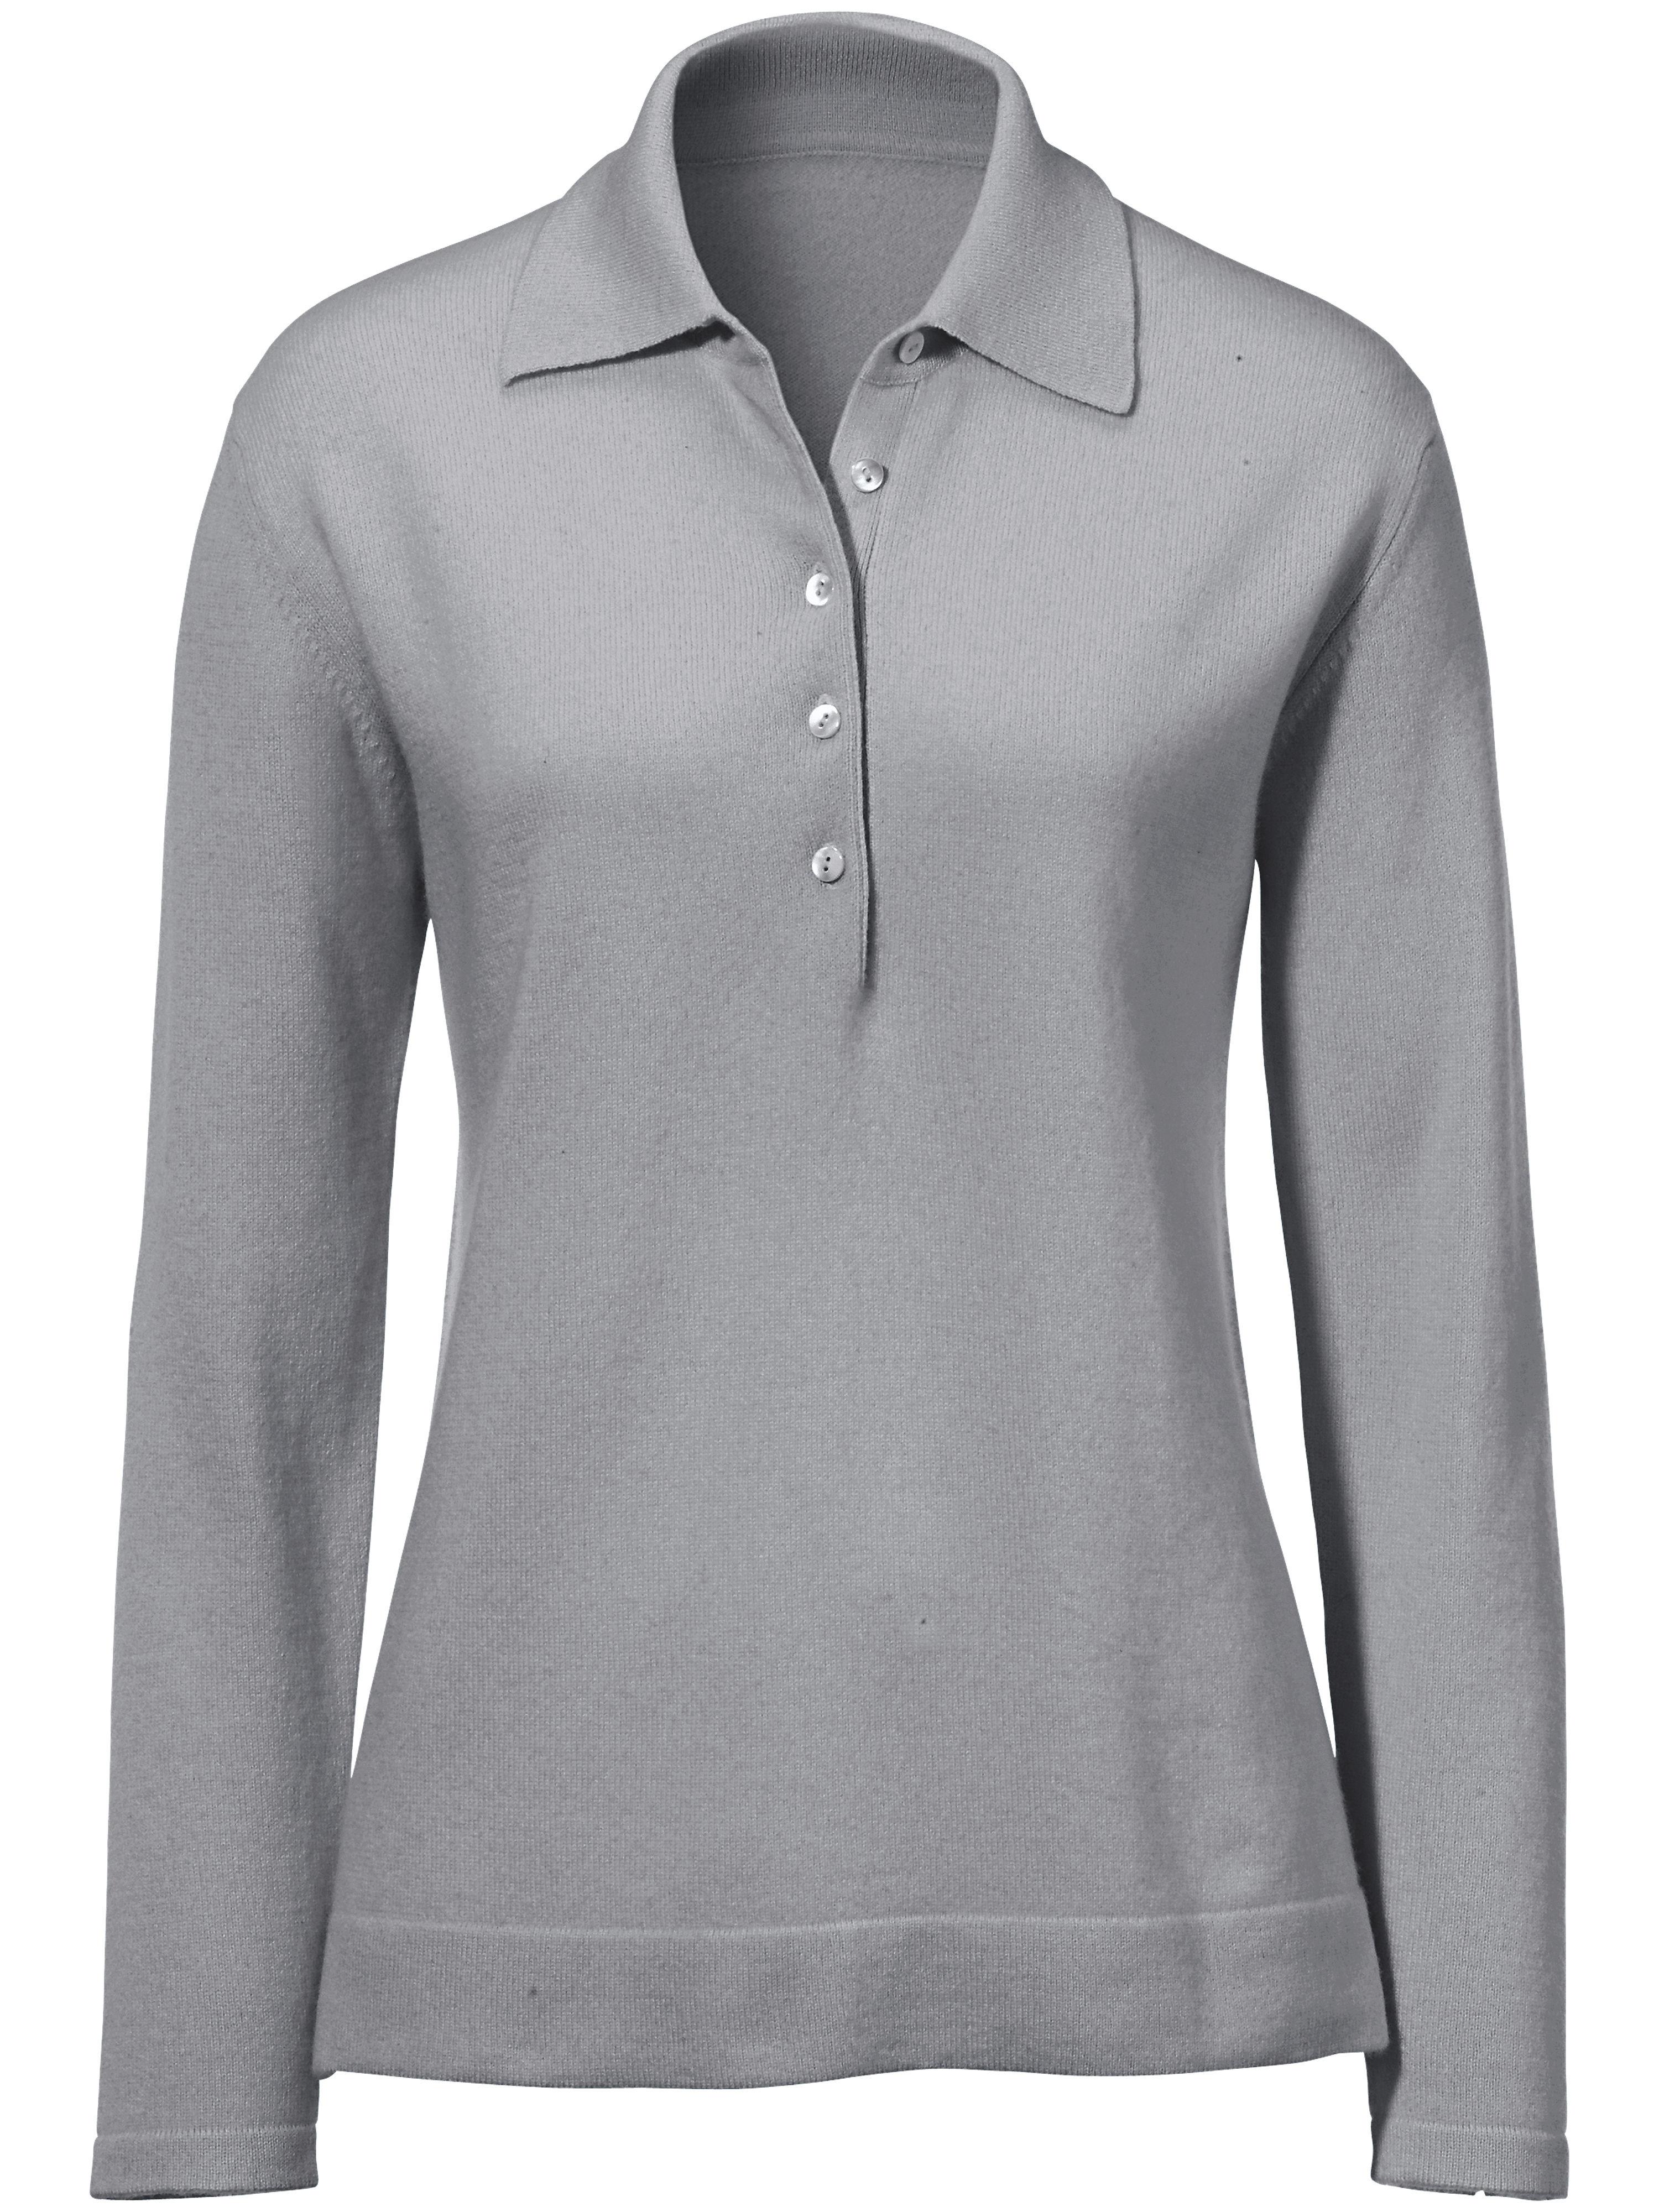 polo pullover aus reinem kaschmir modell paula peter hahn cashmere grau g nstig schnell. Black Bedroom Furniture Sets. Home Design Ideas